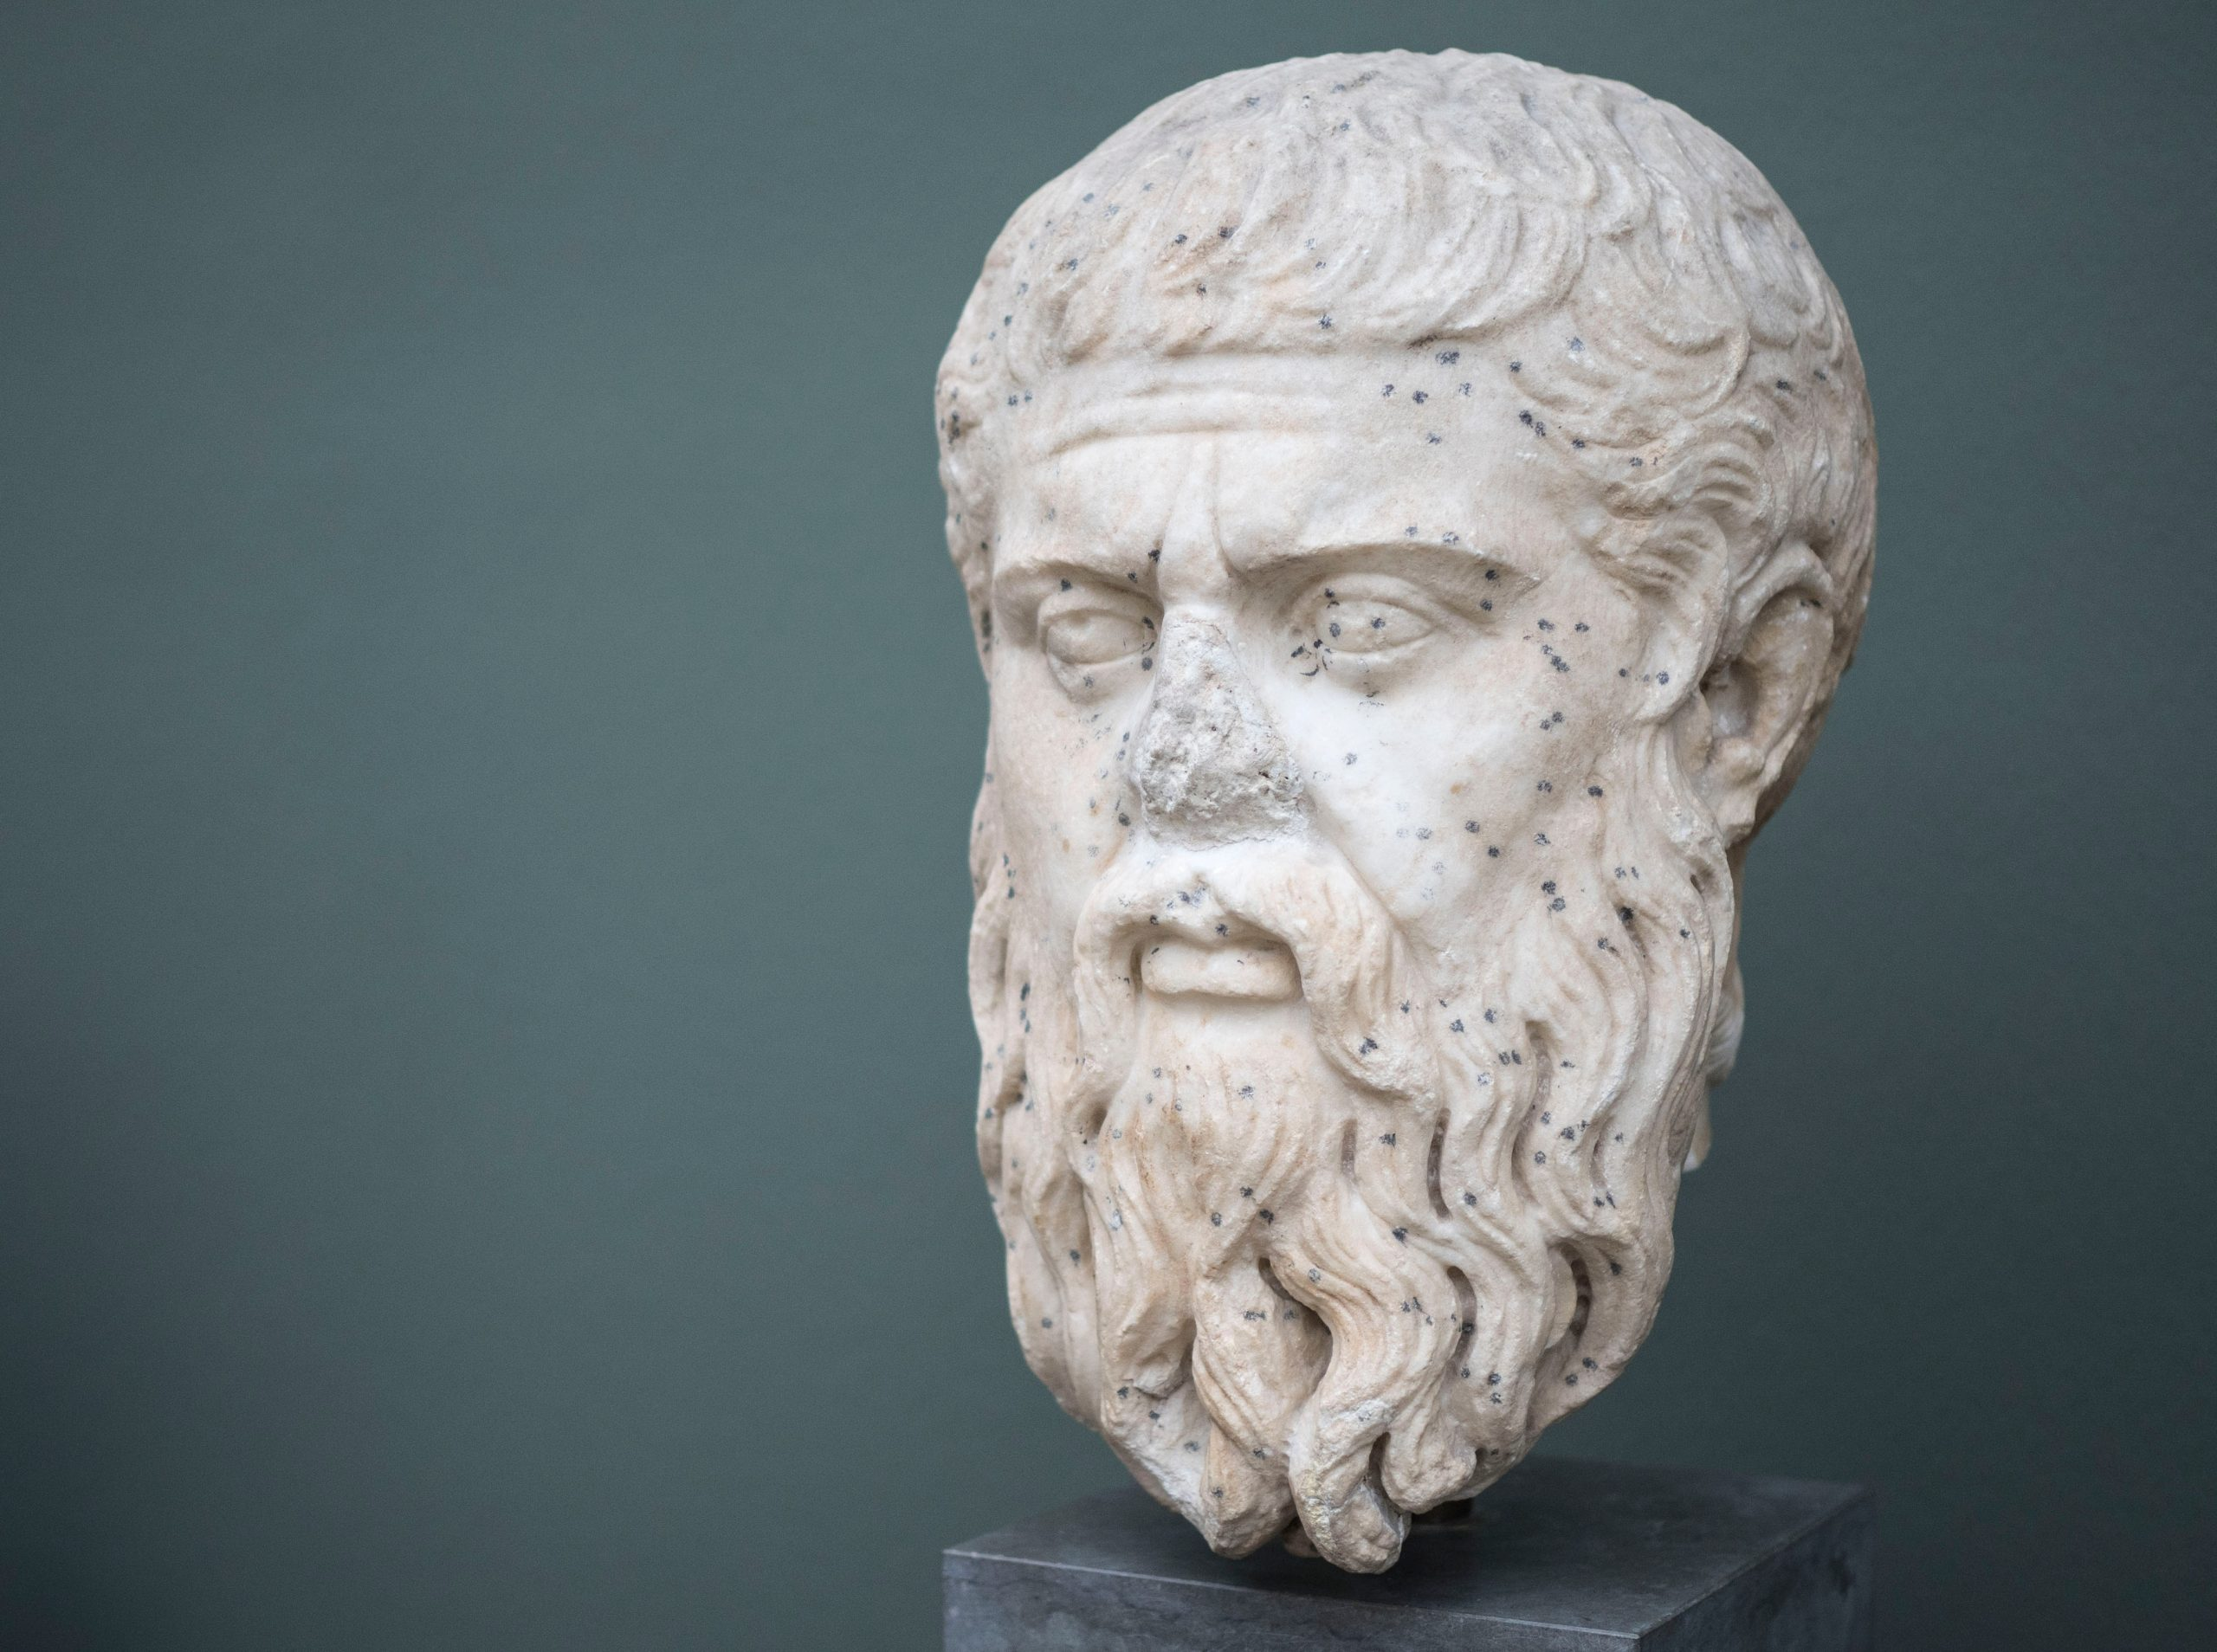 Plato Study Weekend